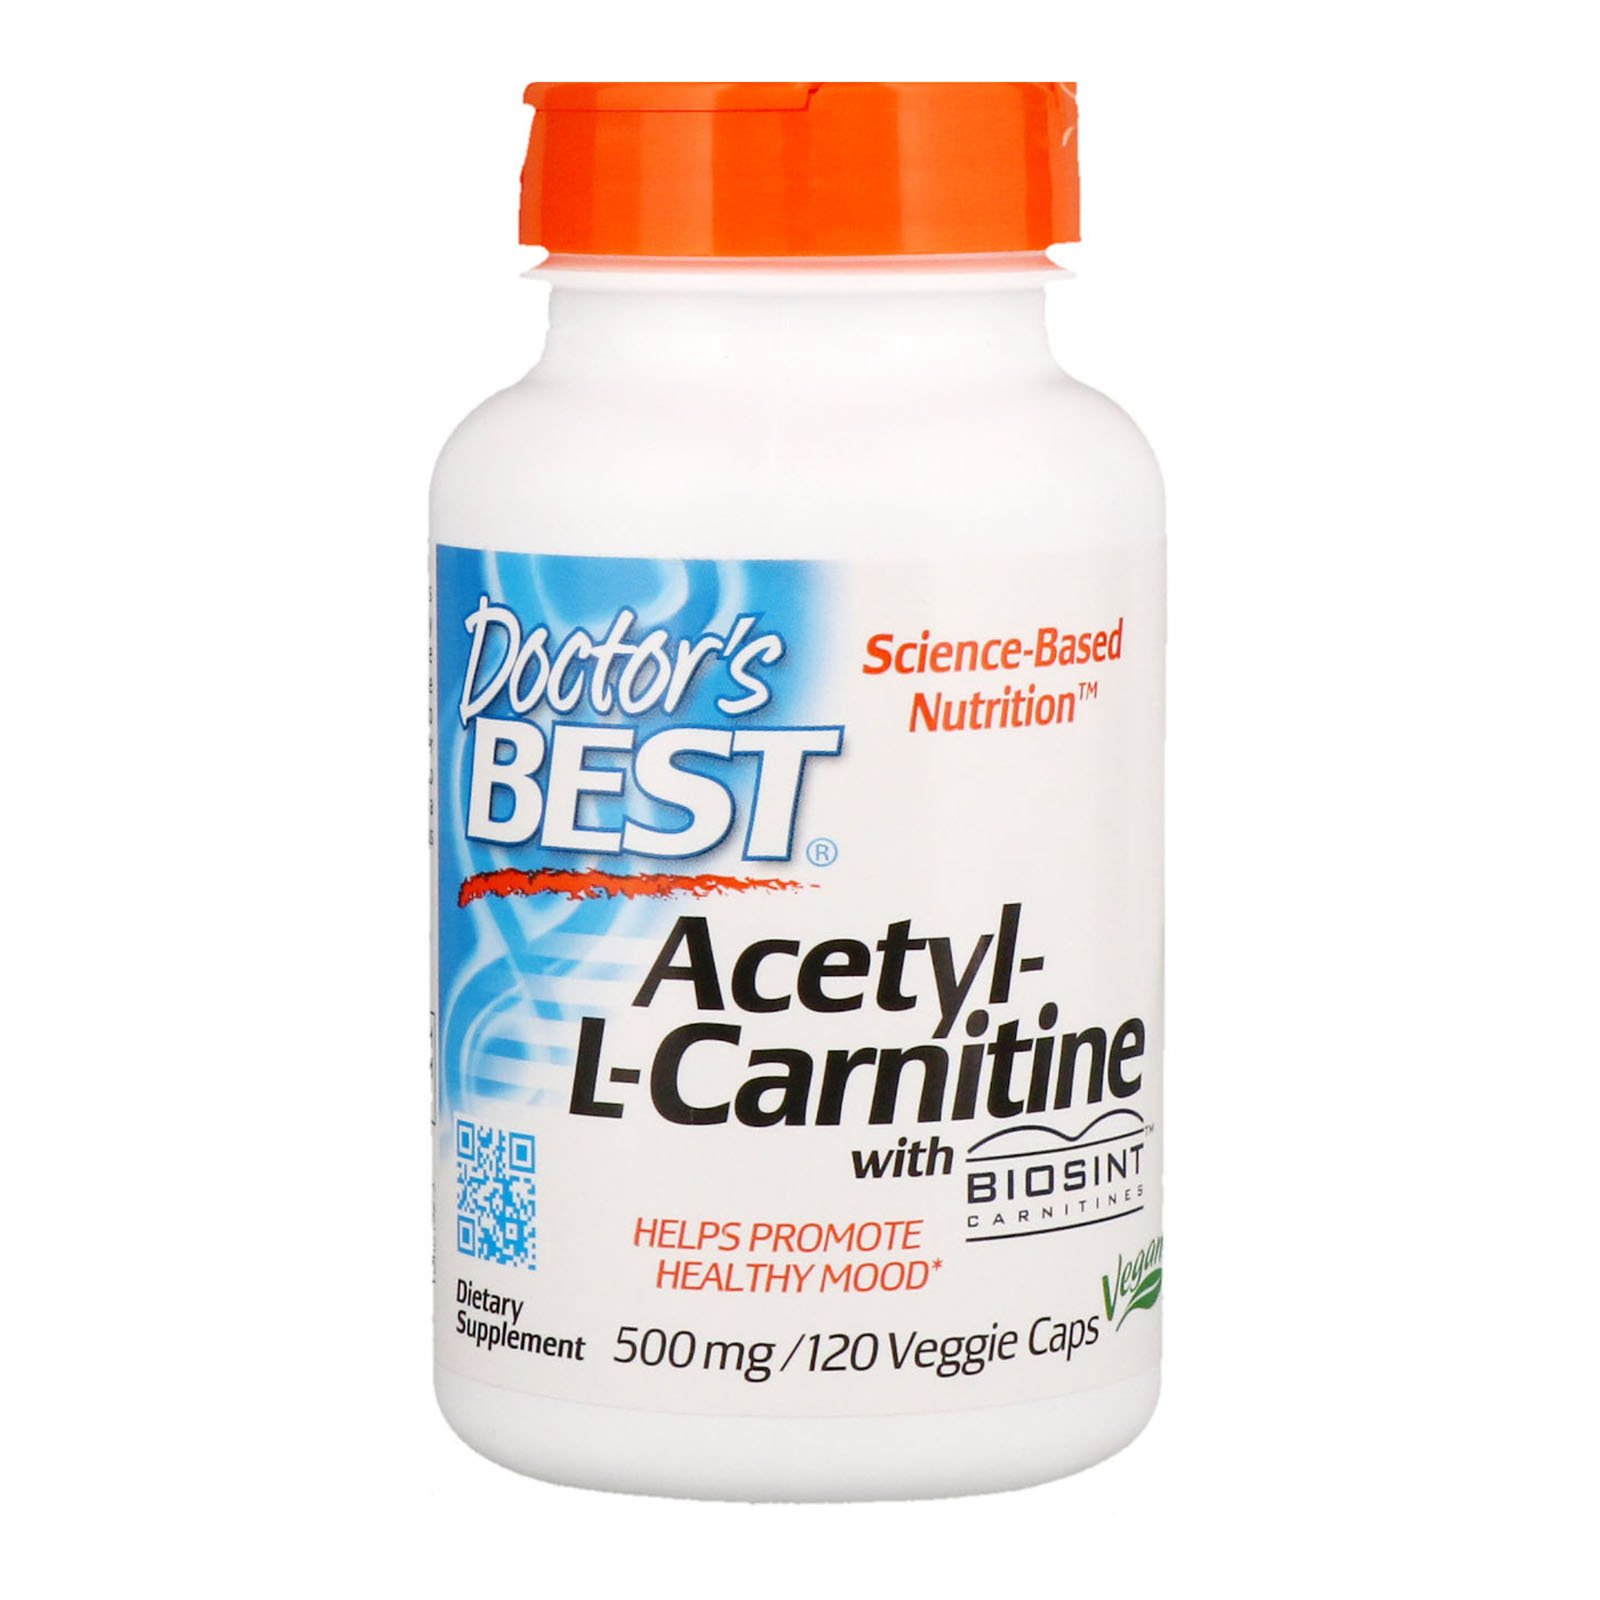 Doctor's Best Acetyl-L-Carnitine with Biosint Carnitines, Non-GMO, Vegan, Gluten Free, 500 mg 120 Veggie Caps